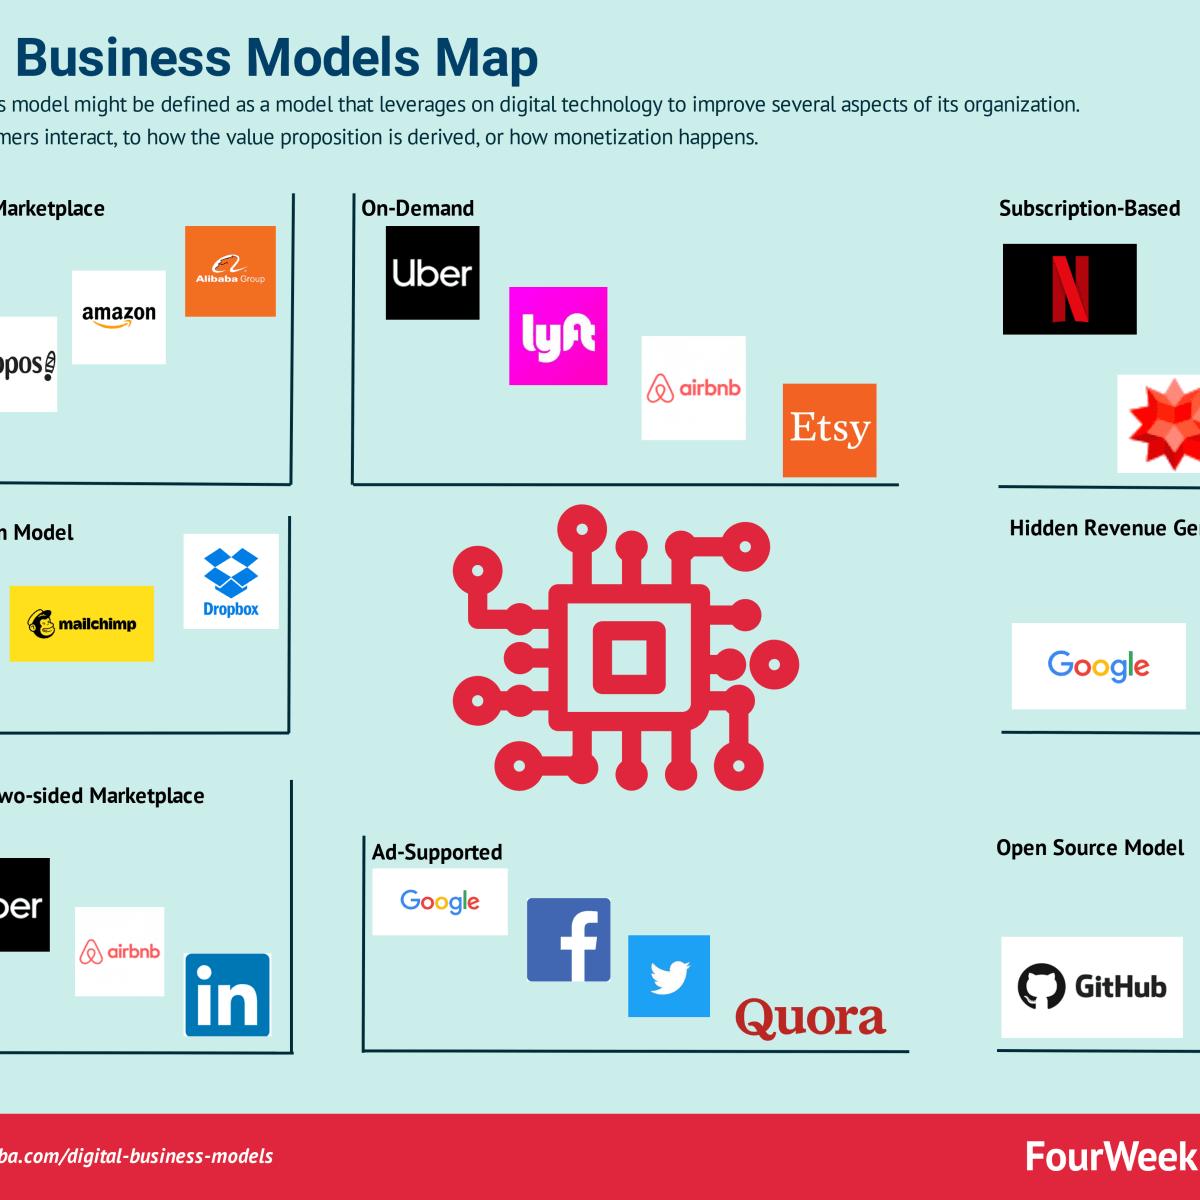 Digital Business Models Map: The Most Popular Digital Business Model